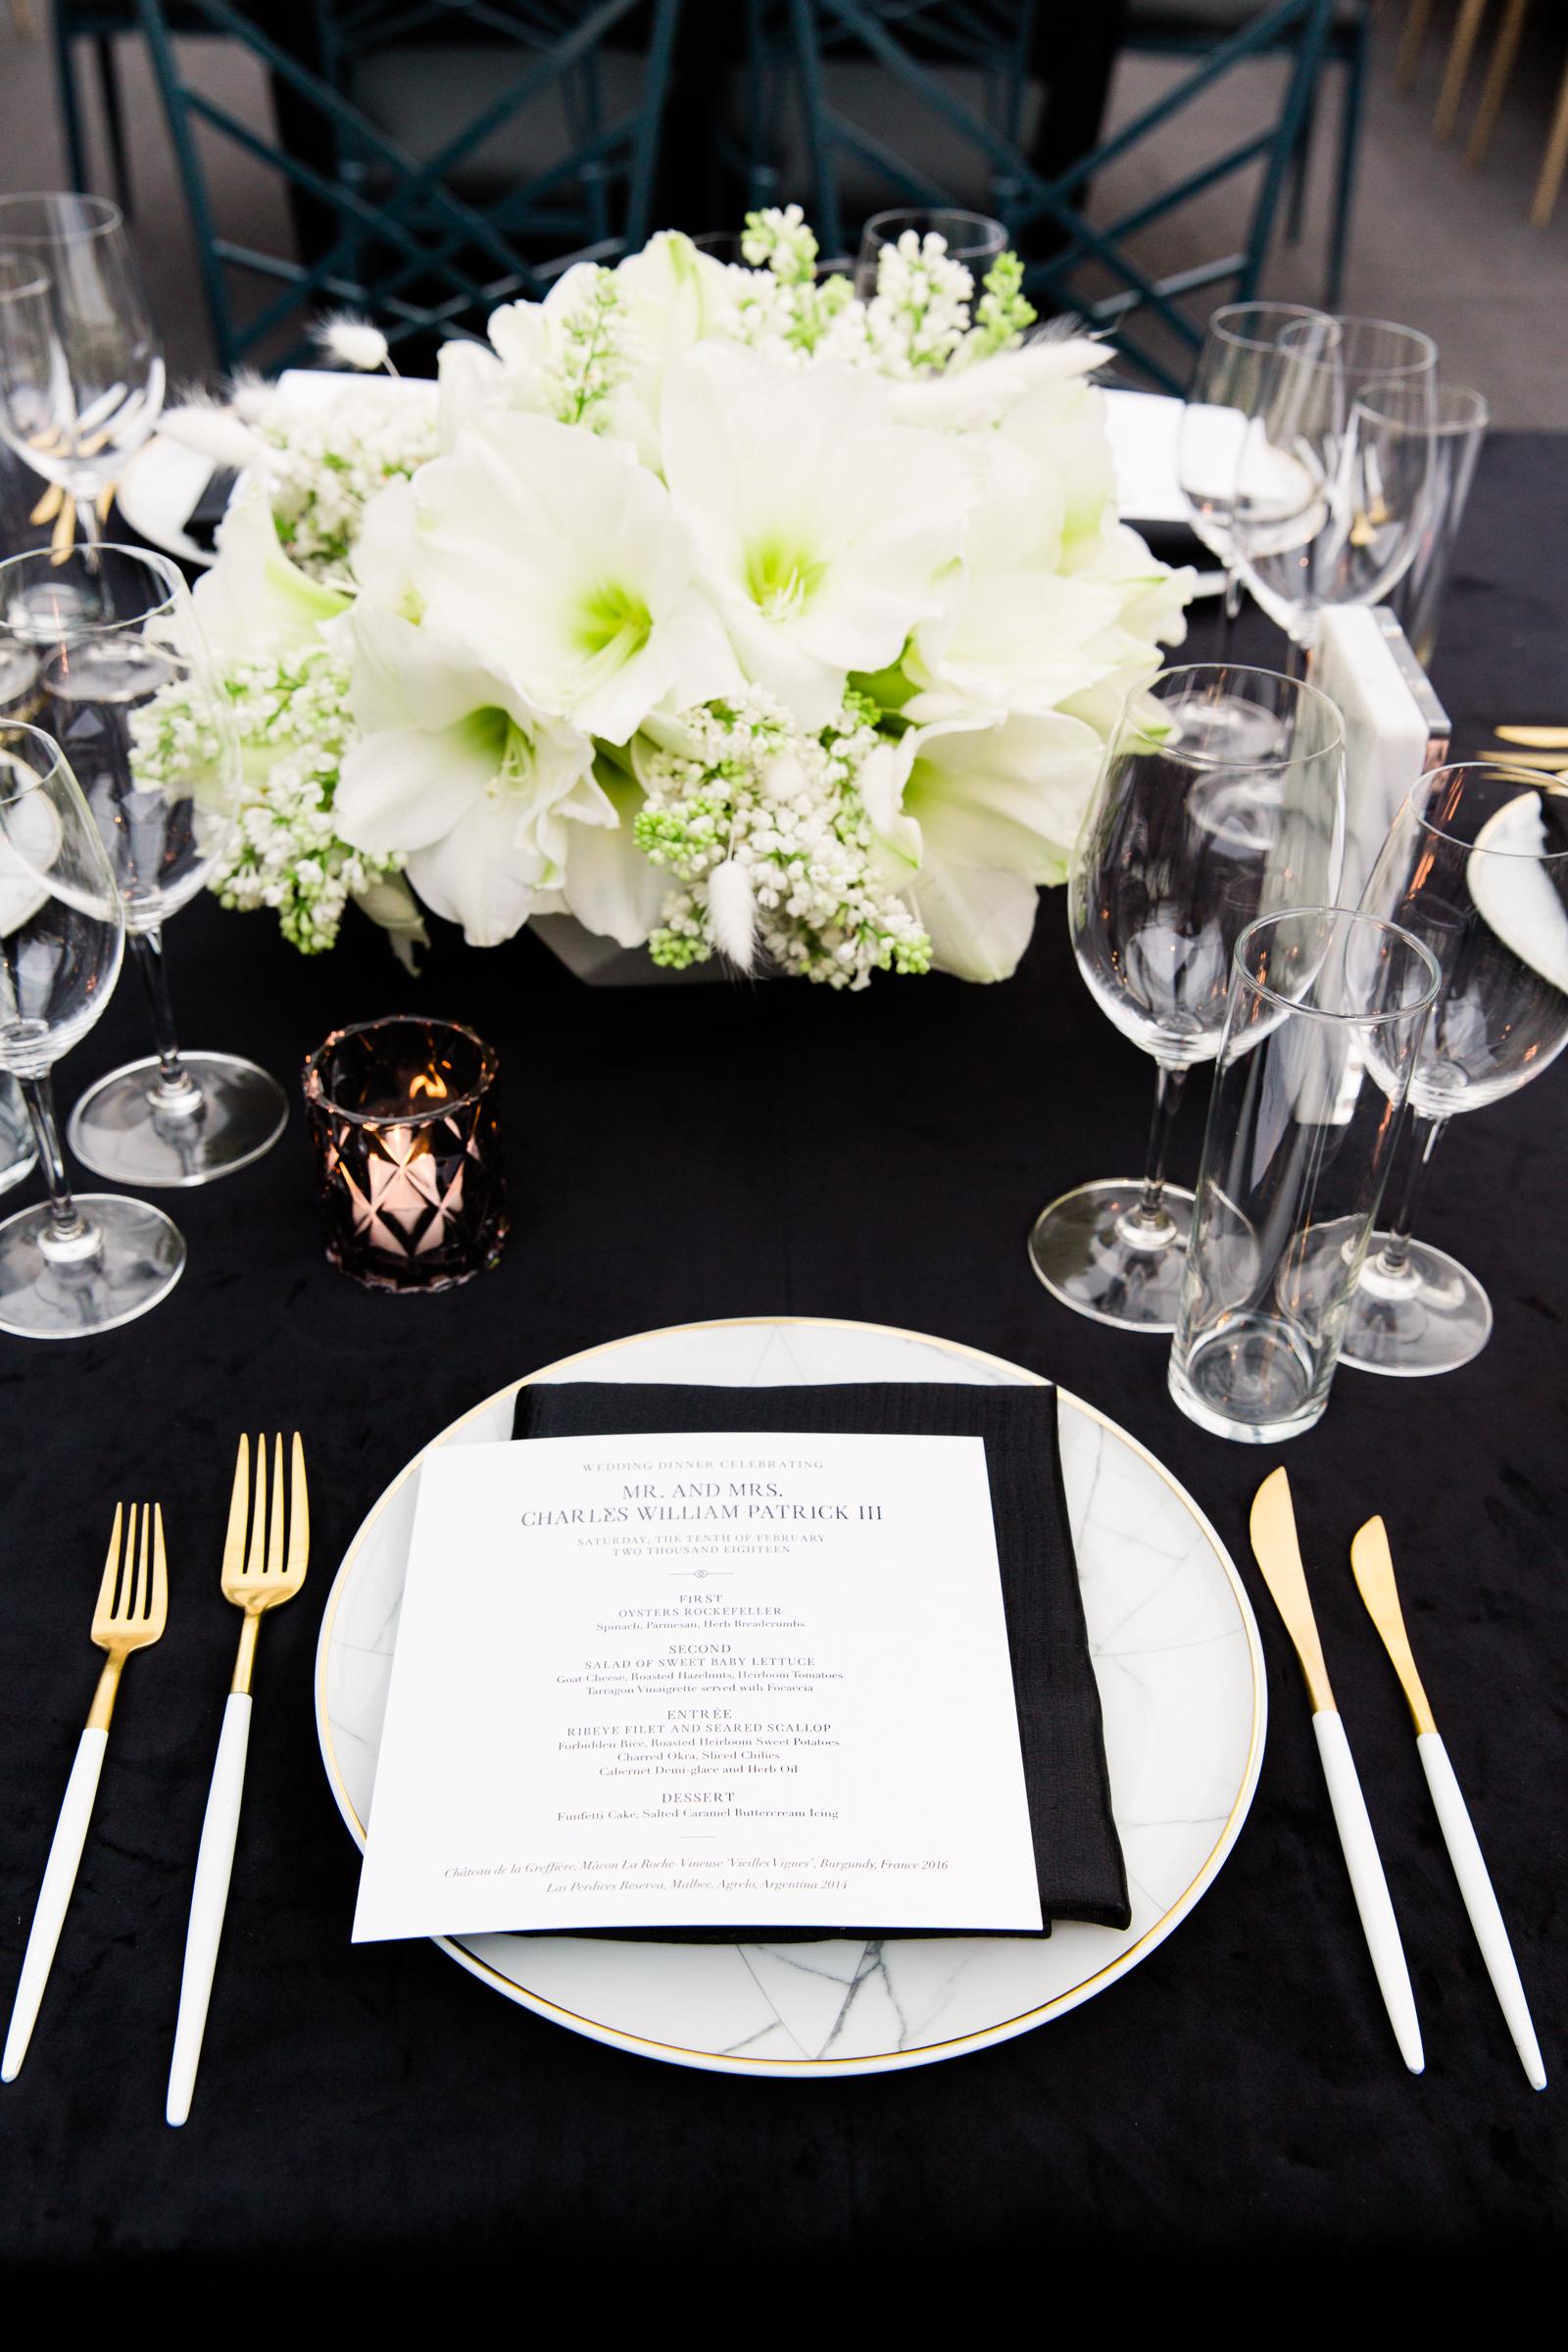 hamida charlie charleson wedding place setting black and white